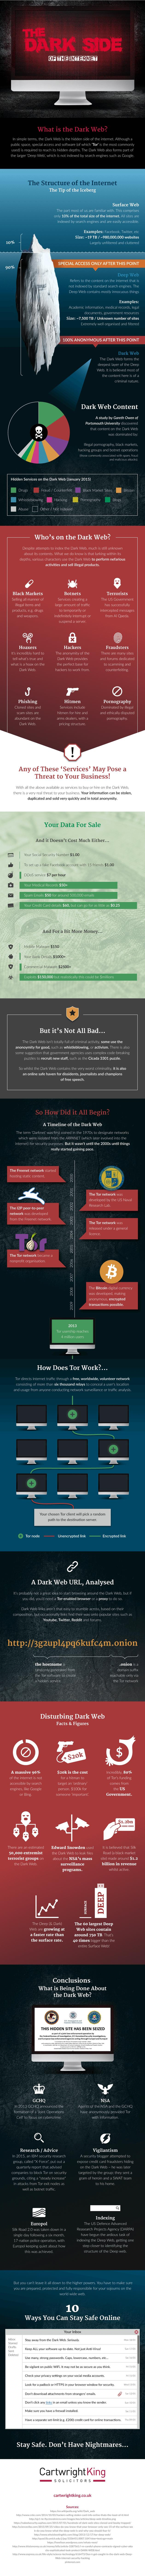 Deep Web и Dark Web - скритото лице на интернет инфографика